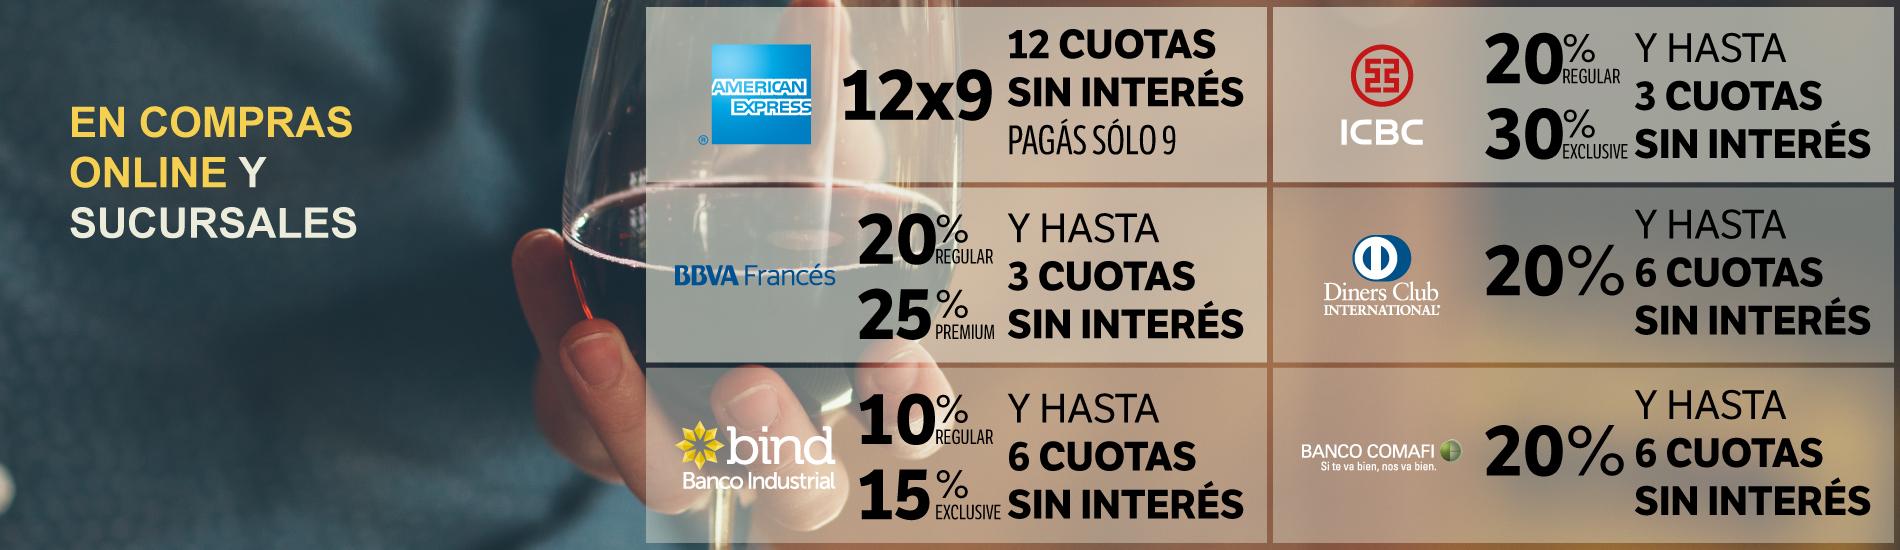 Promo Bancos Dom Lunes